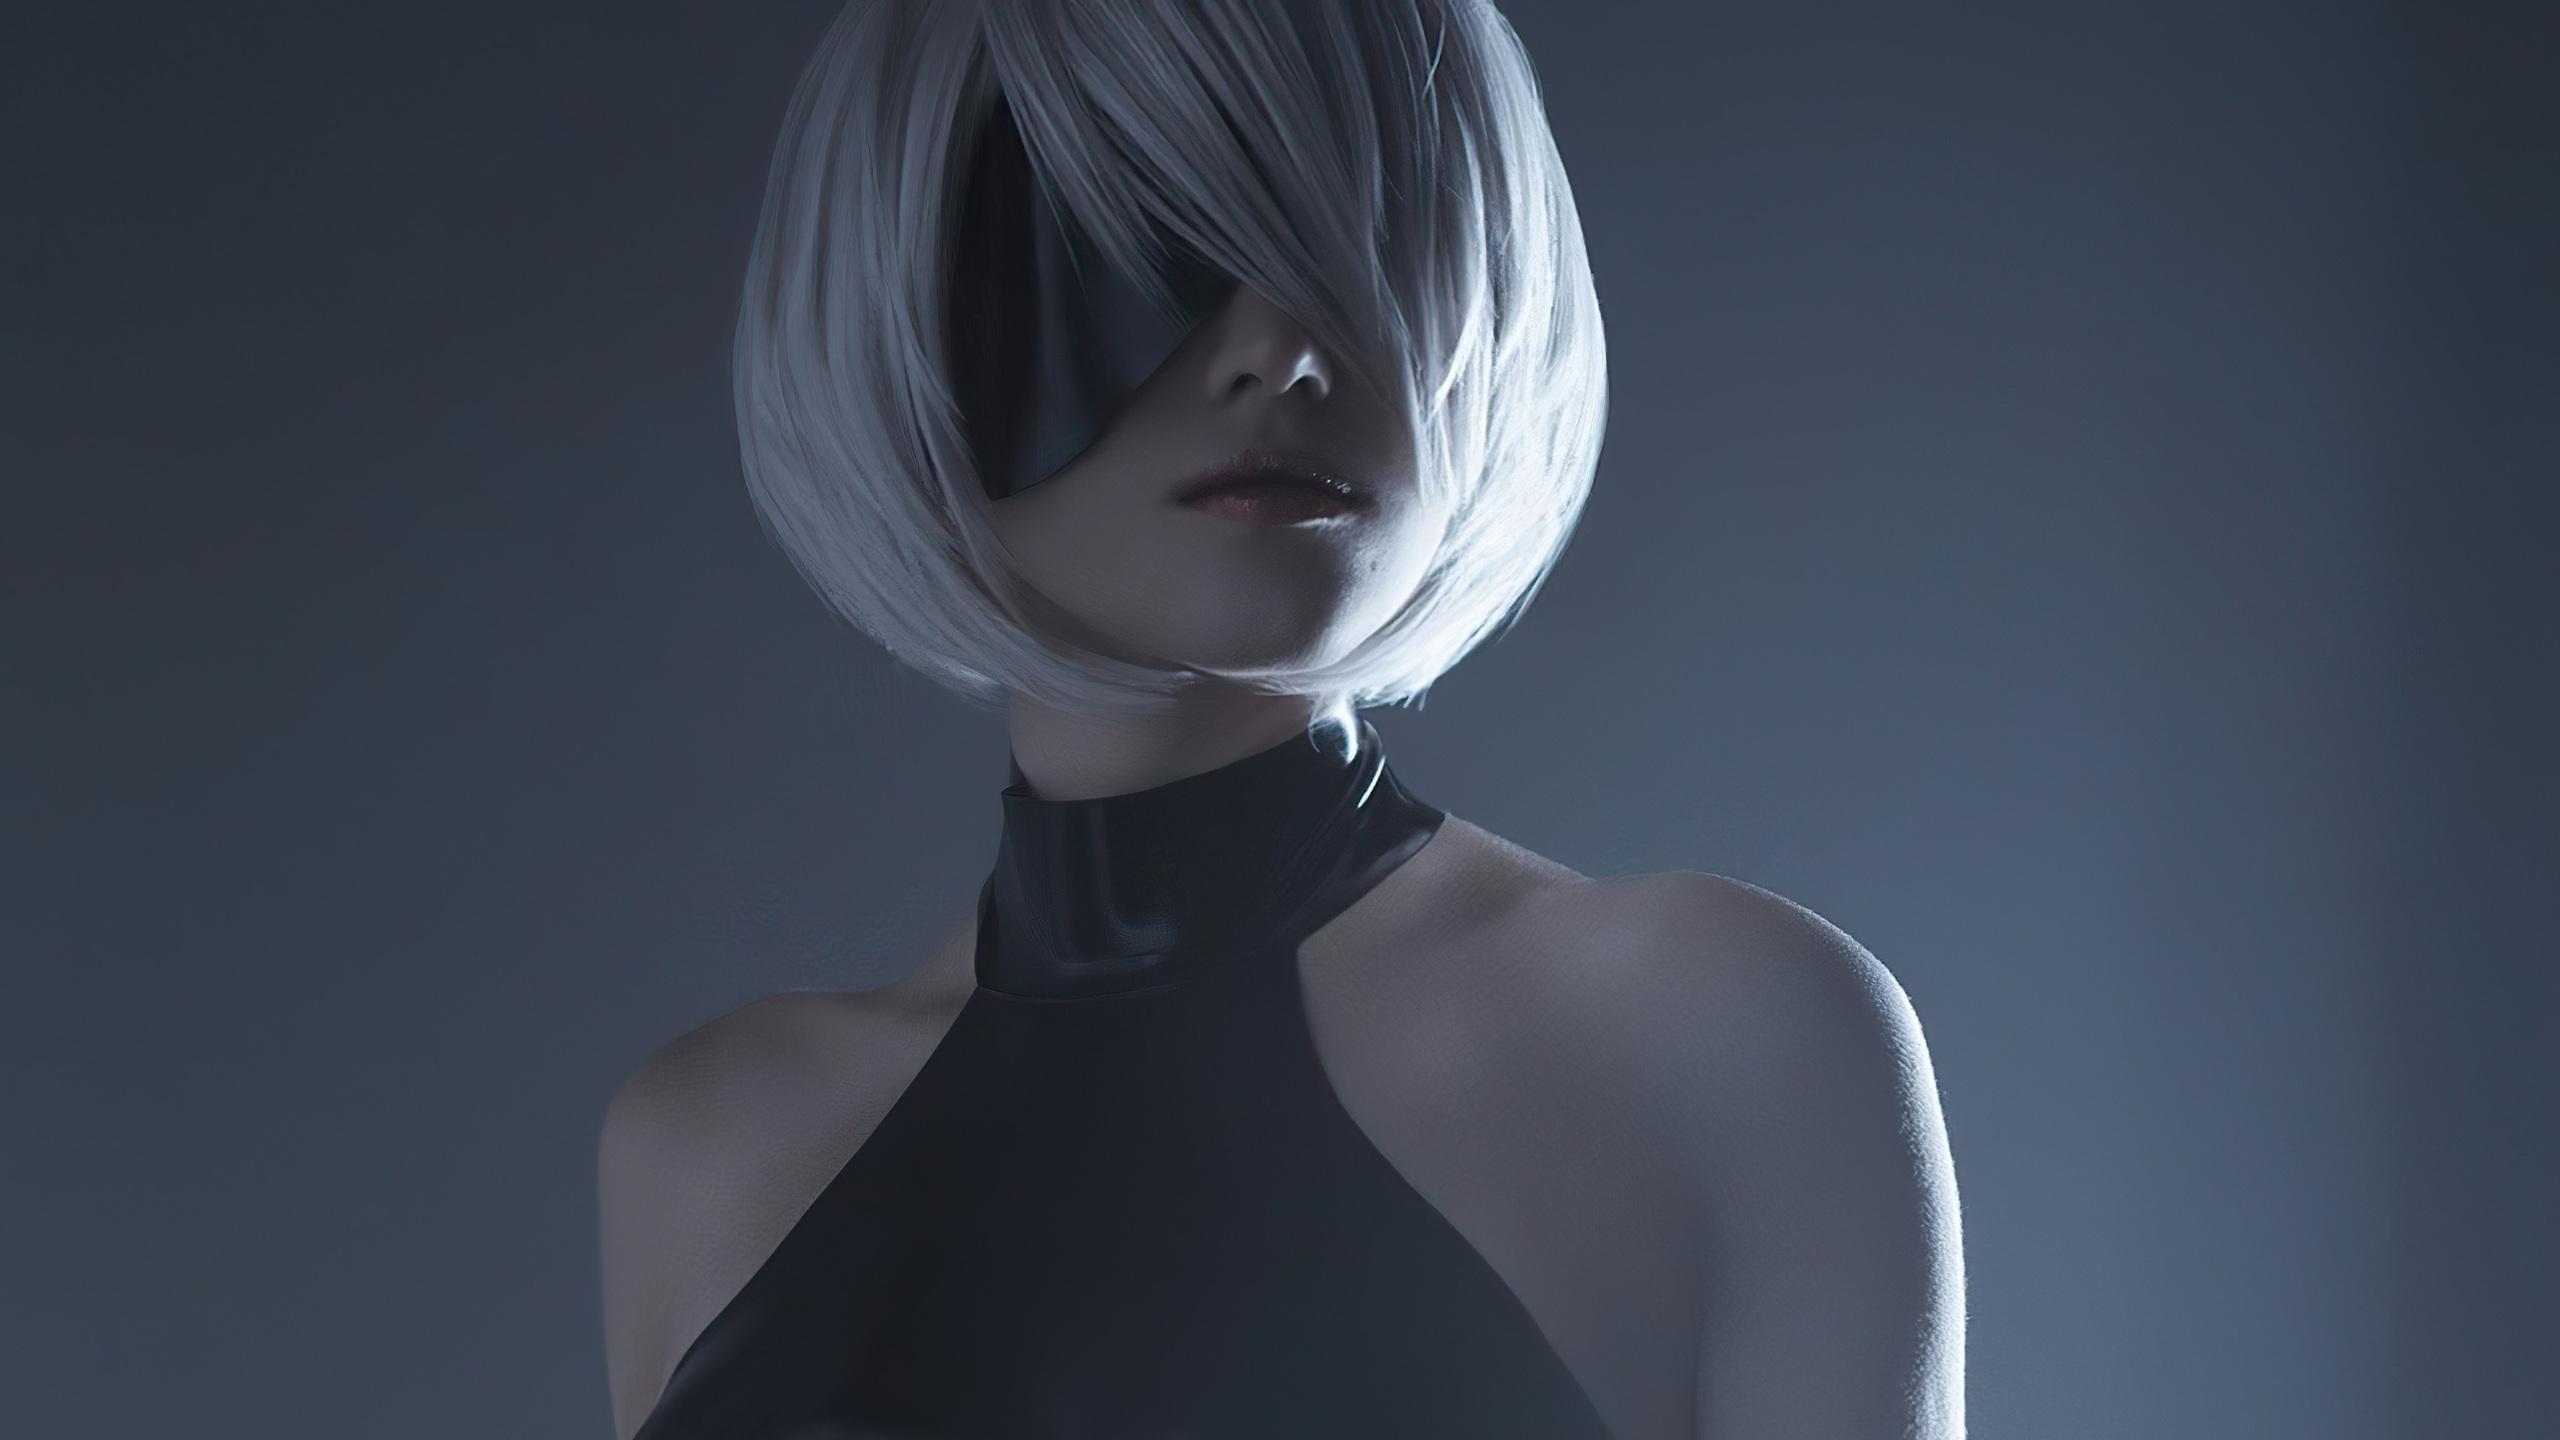 nier-automata-short-hair-cosplay-4k-r4.jpg